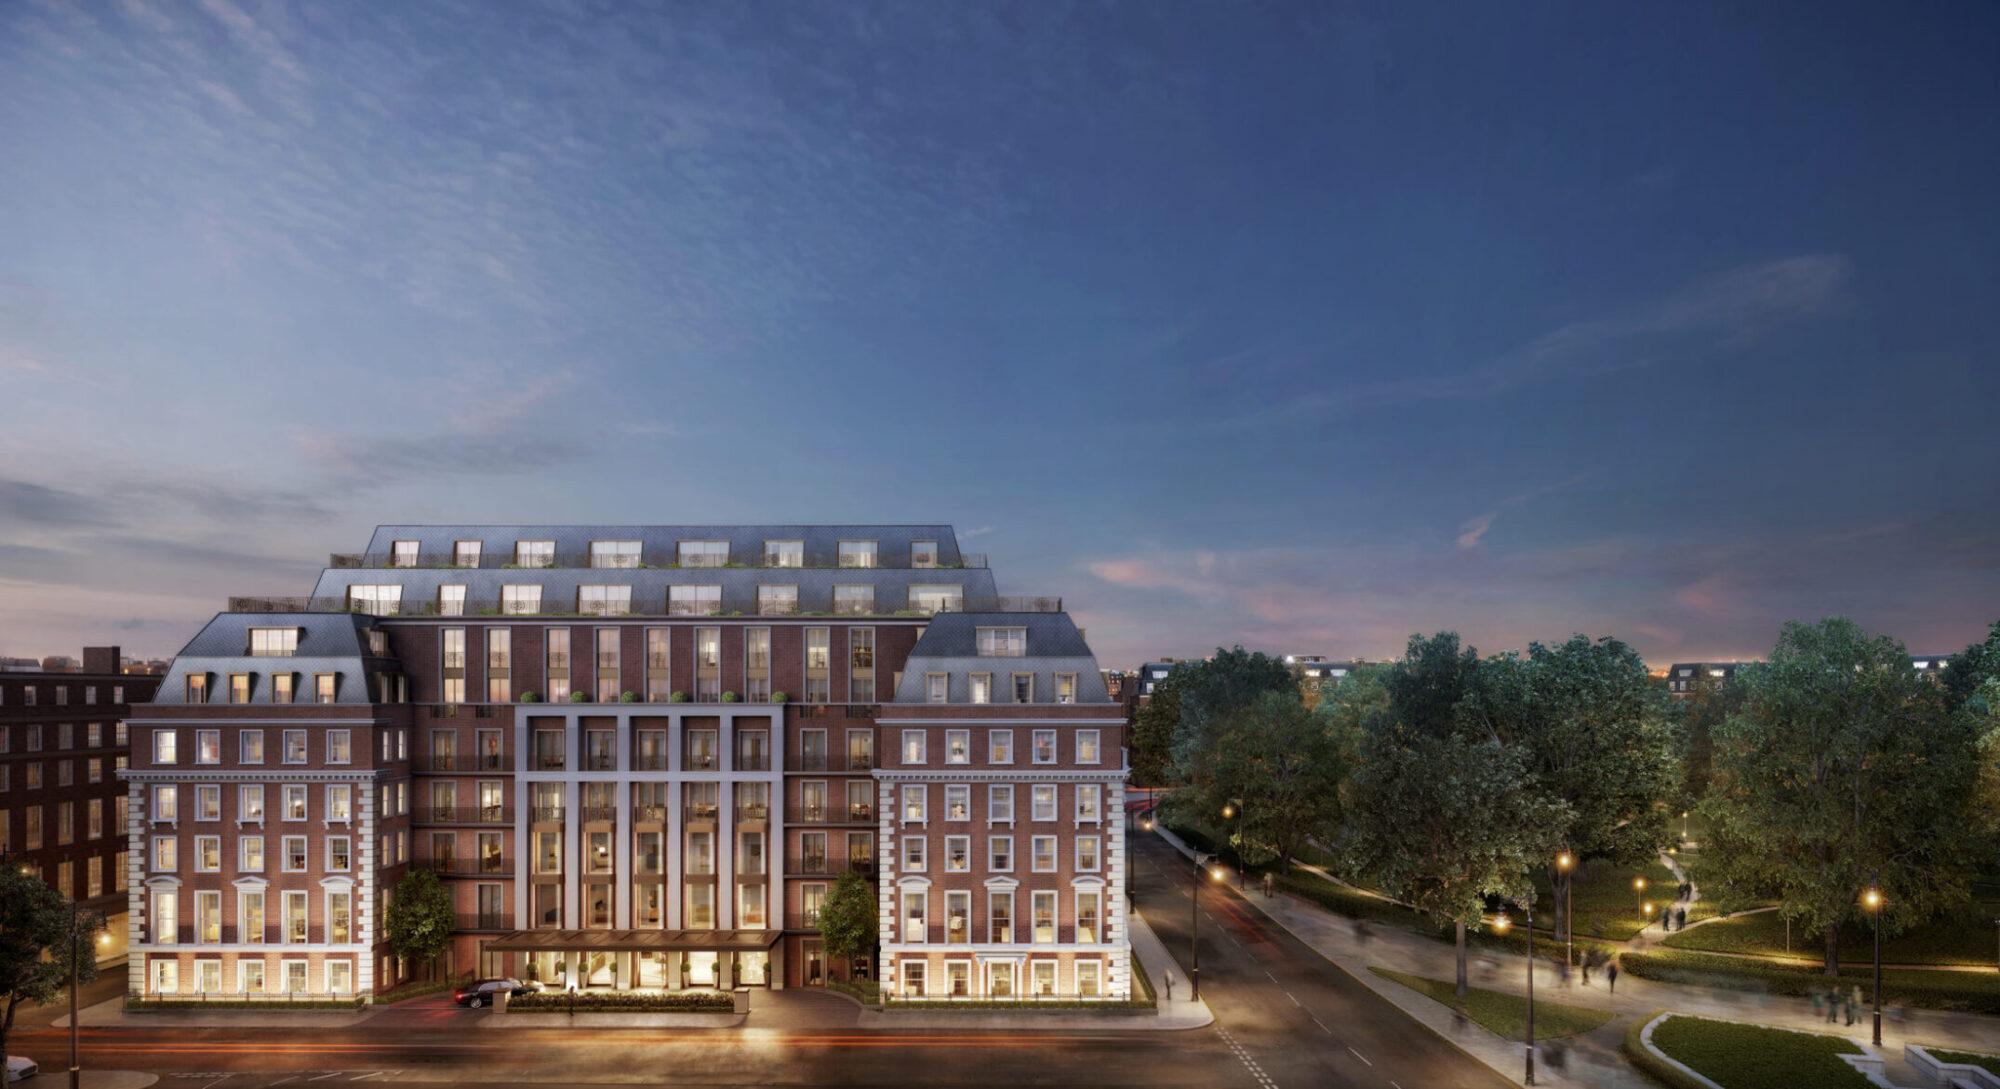 Twenty Grosvenor Square / Knight Frank